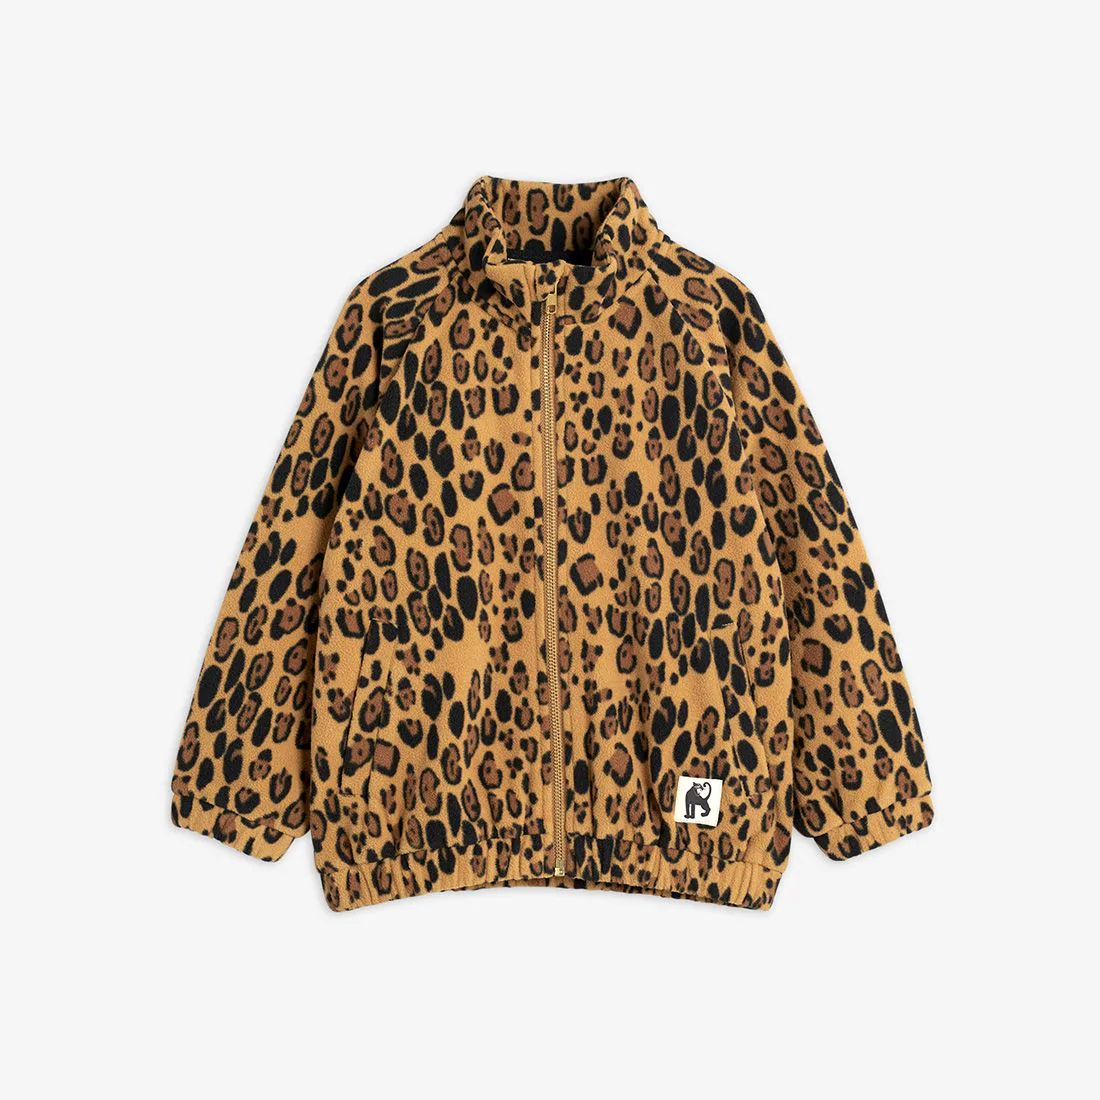 Adorable Leopard Fleece Jacket